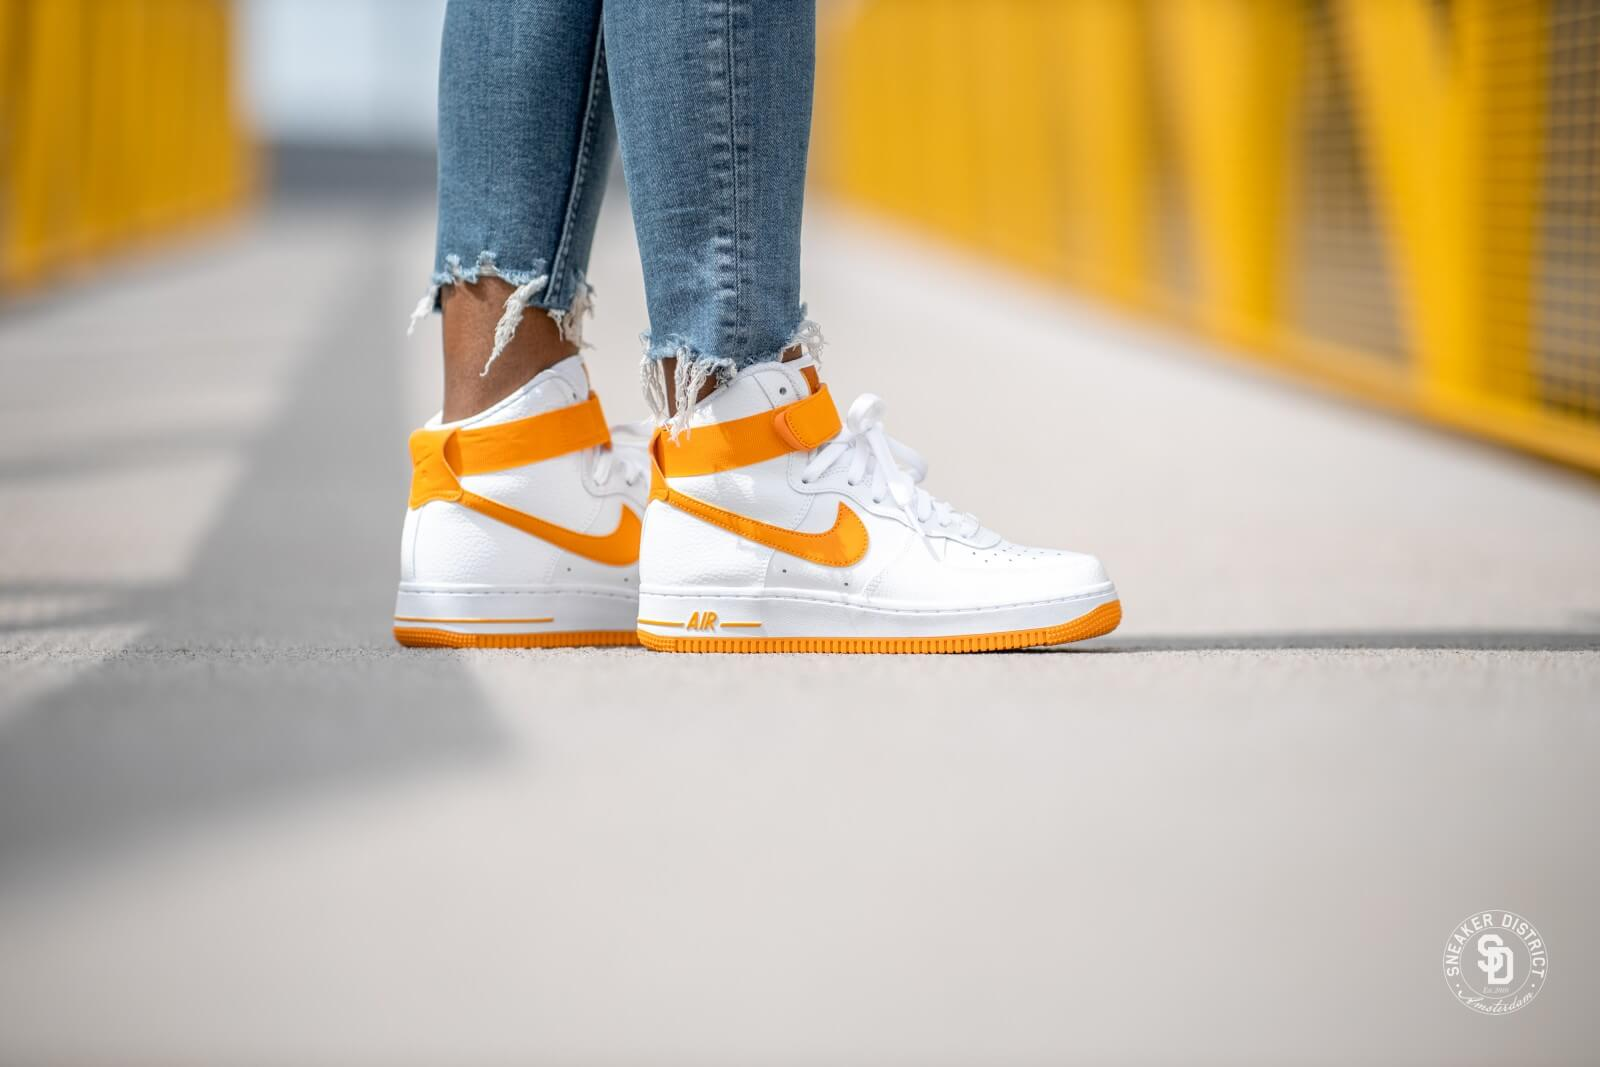 Nike Women's Air Force 1 High White/Orange Peel